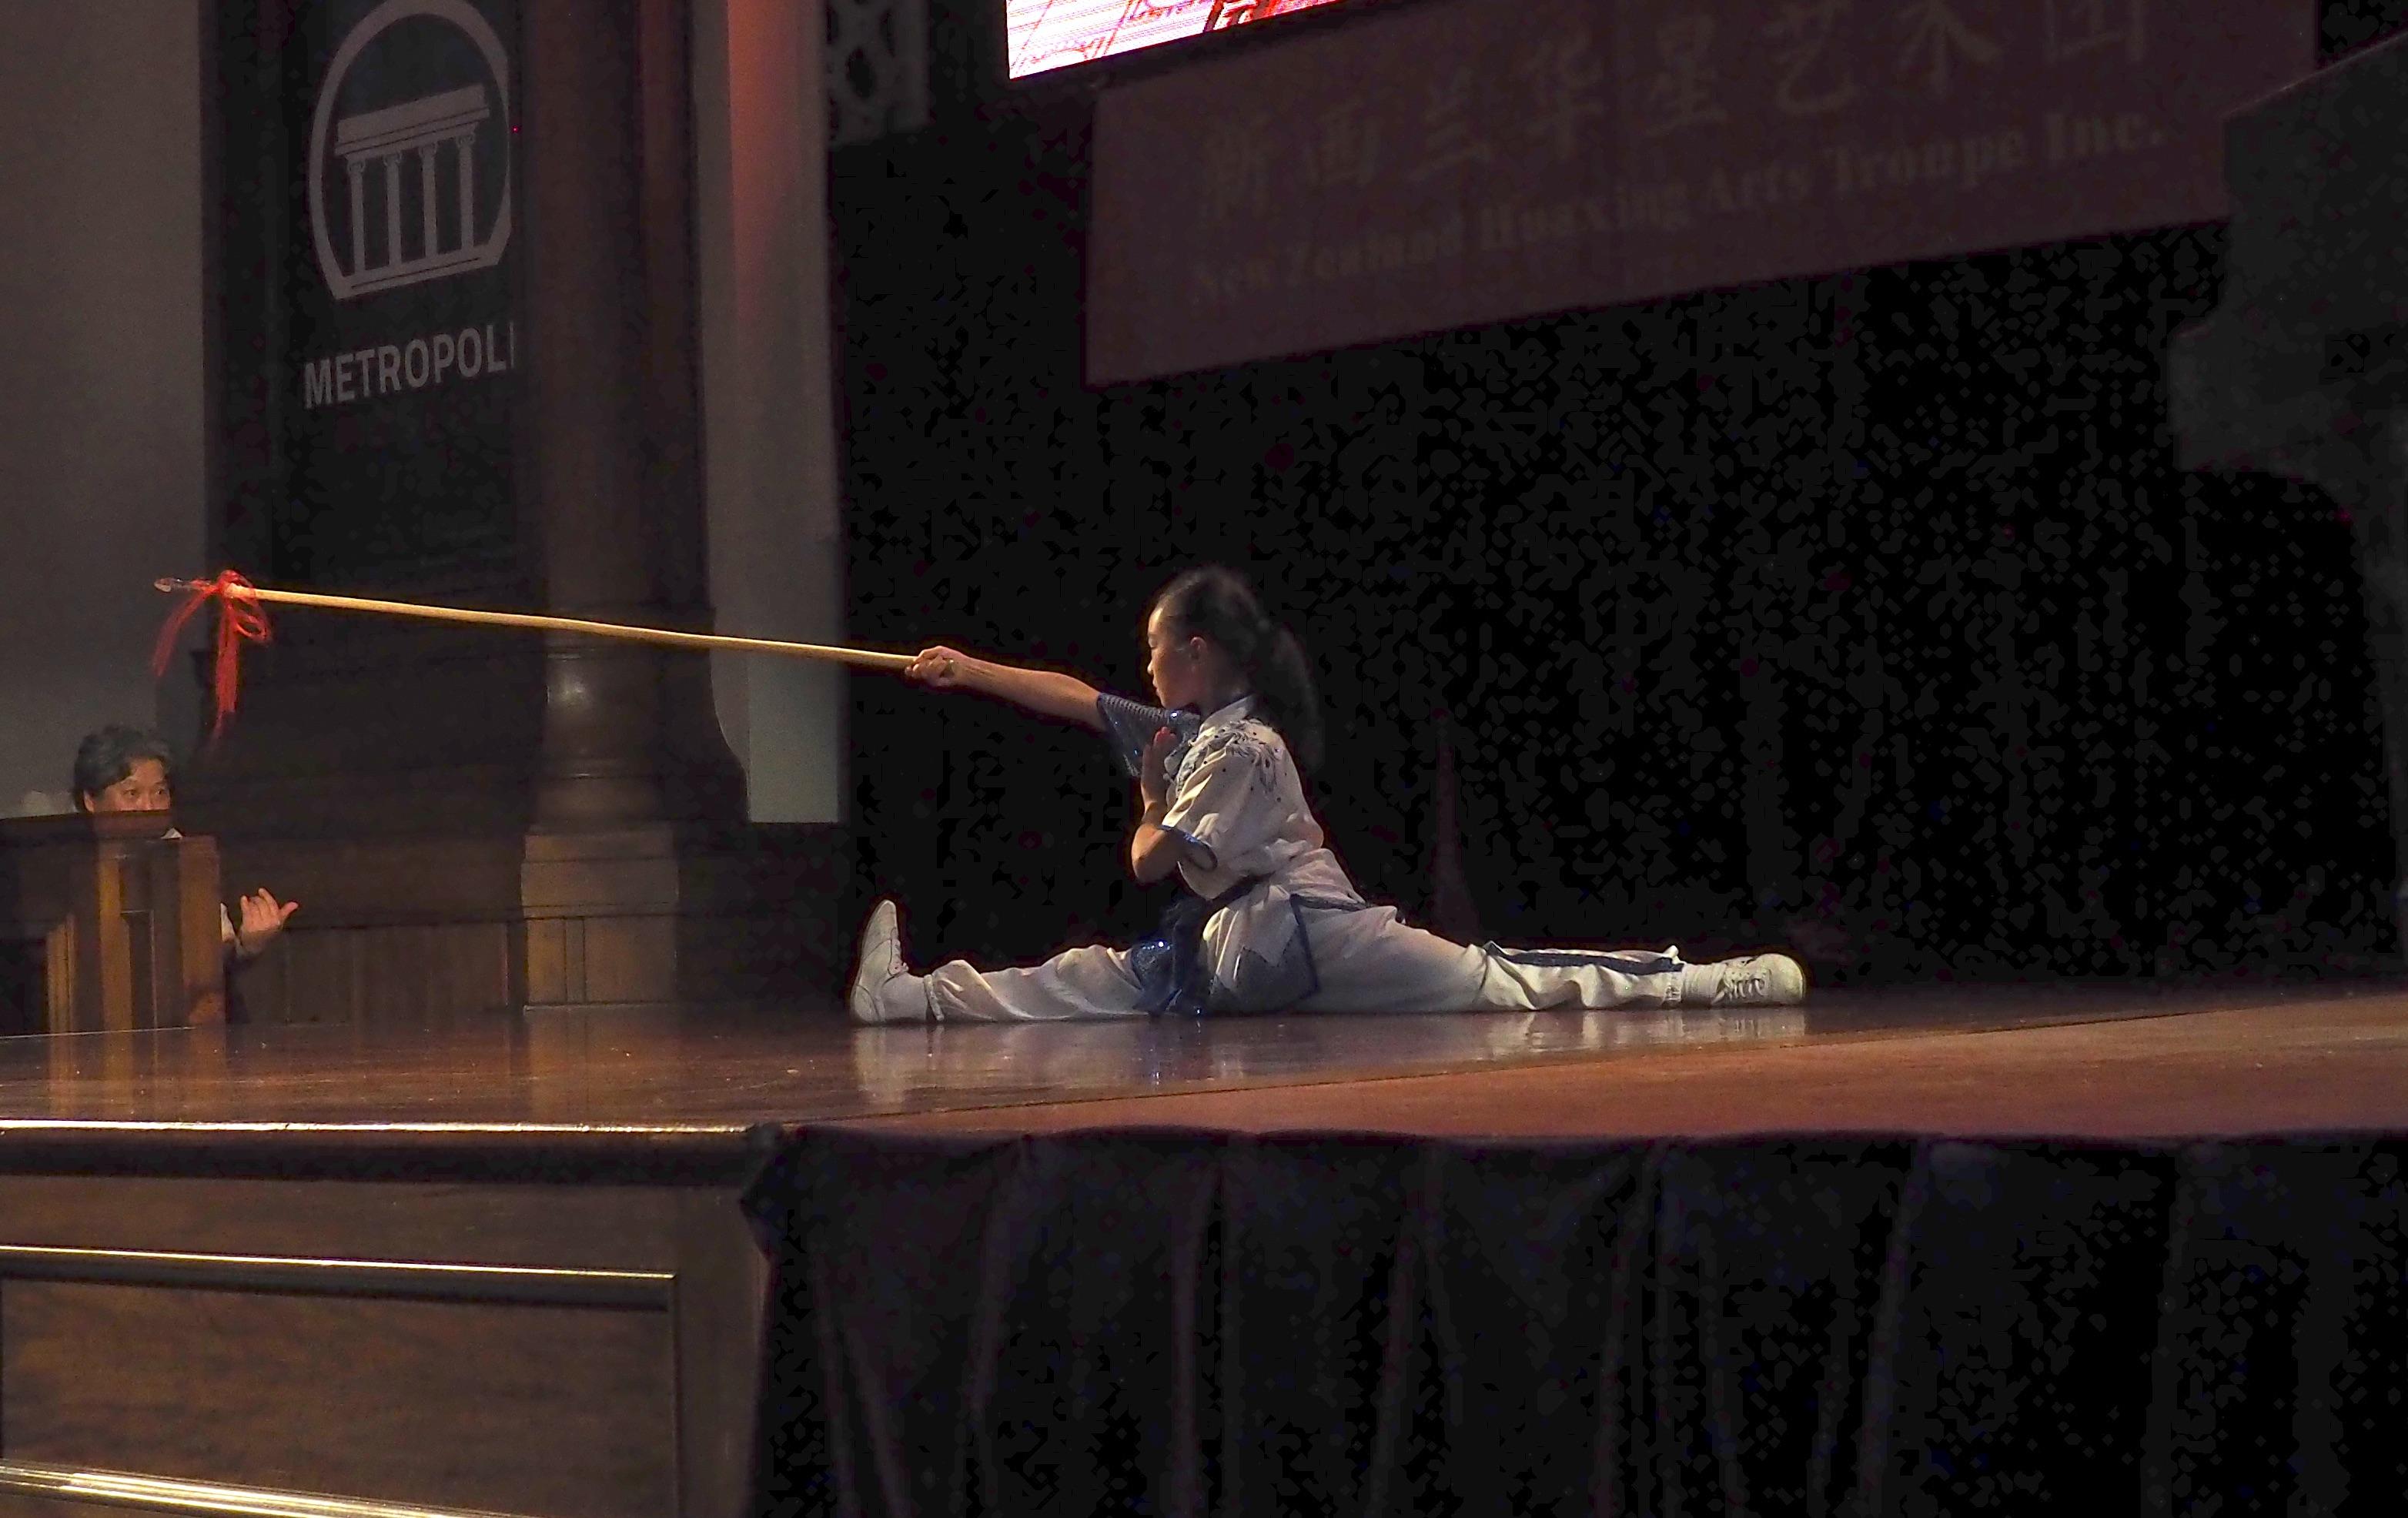 Spear Splits Auckland Performance